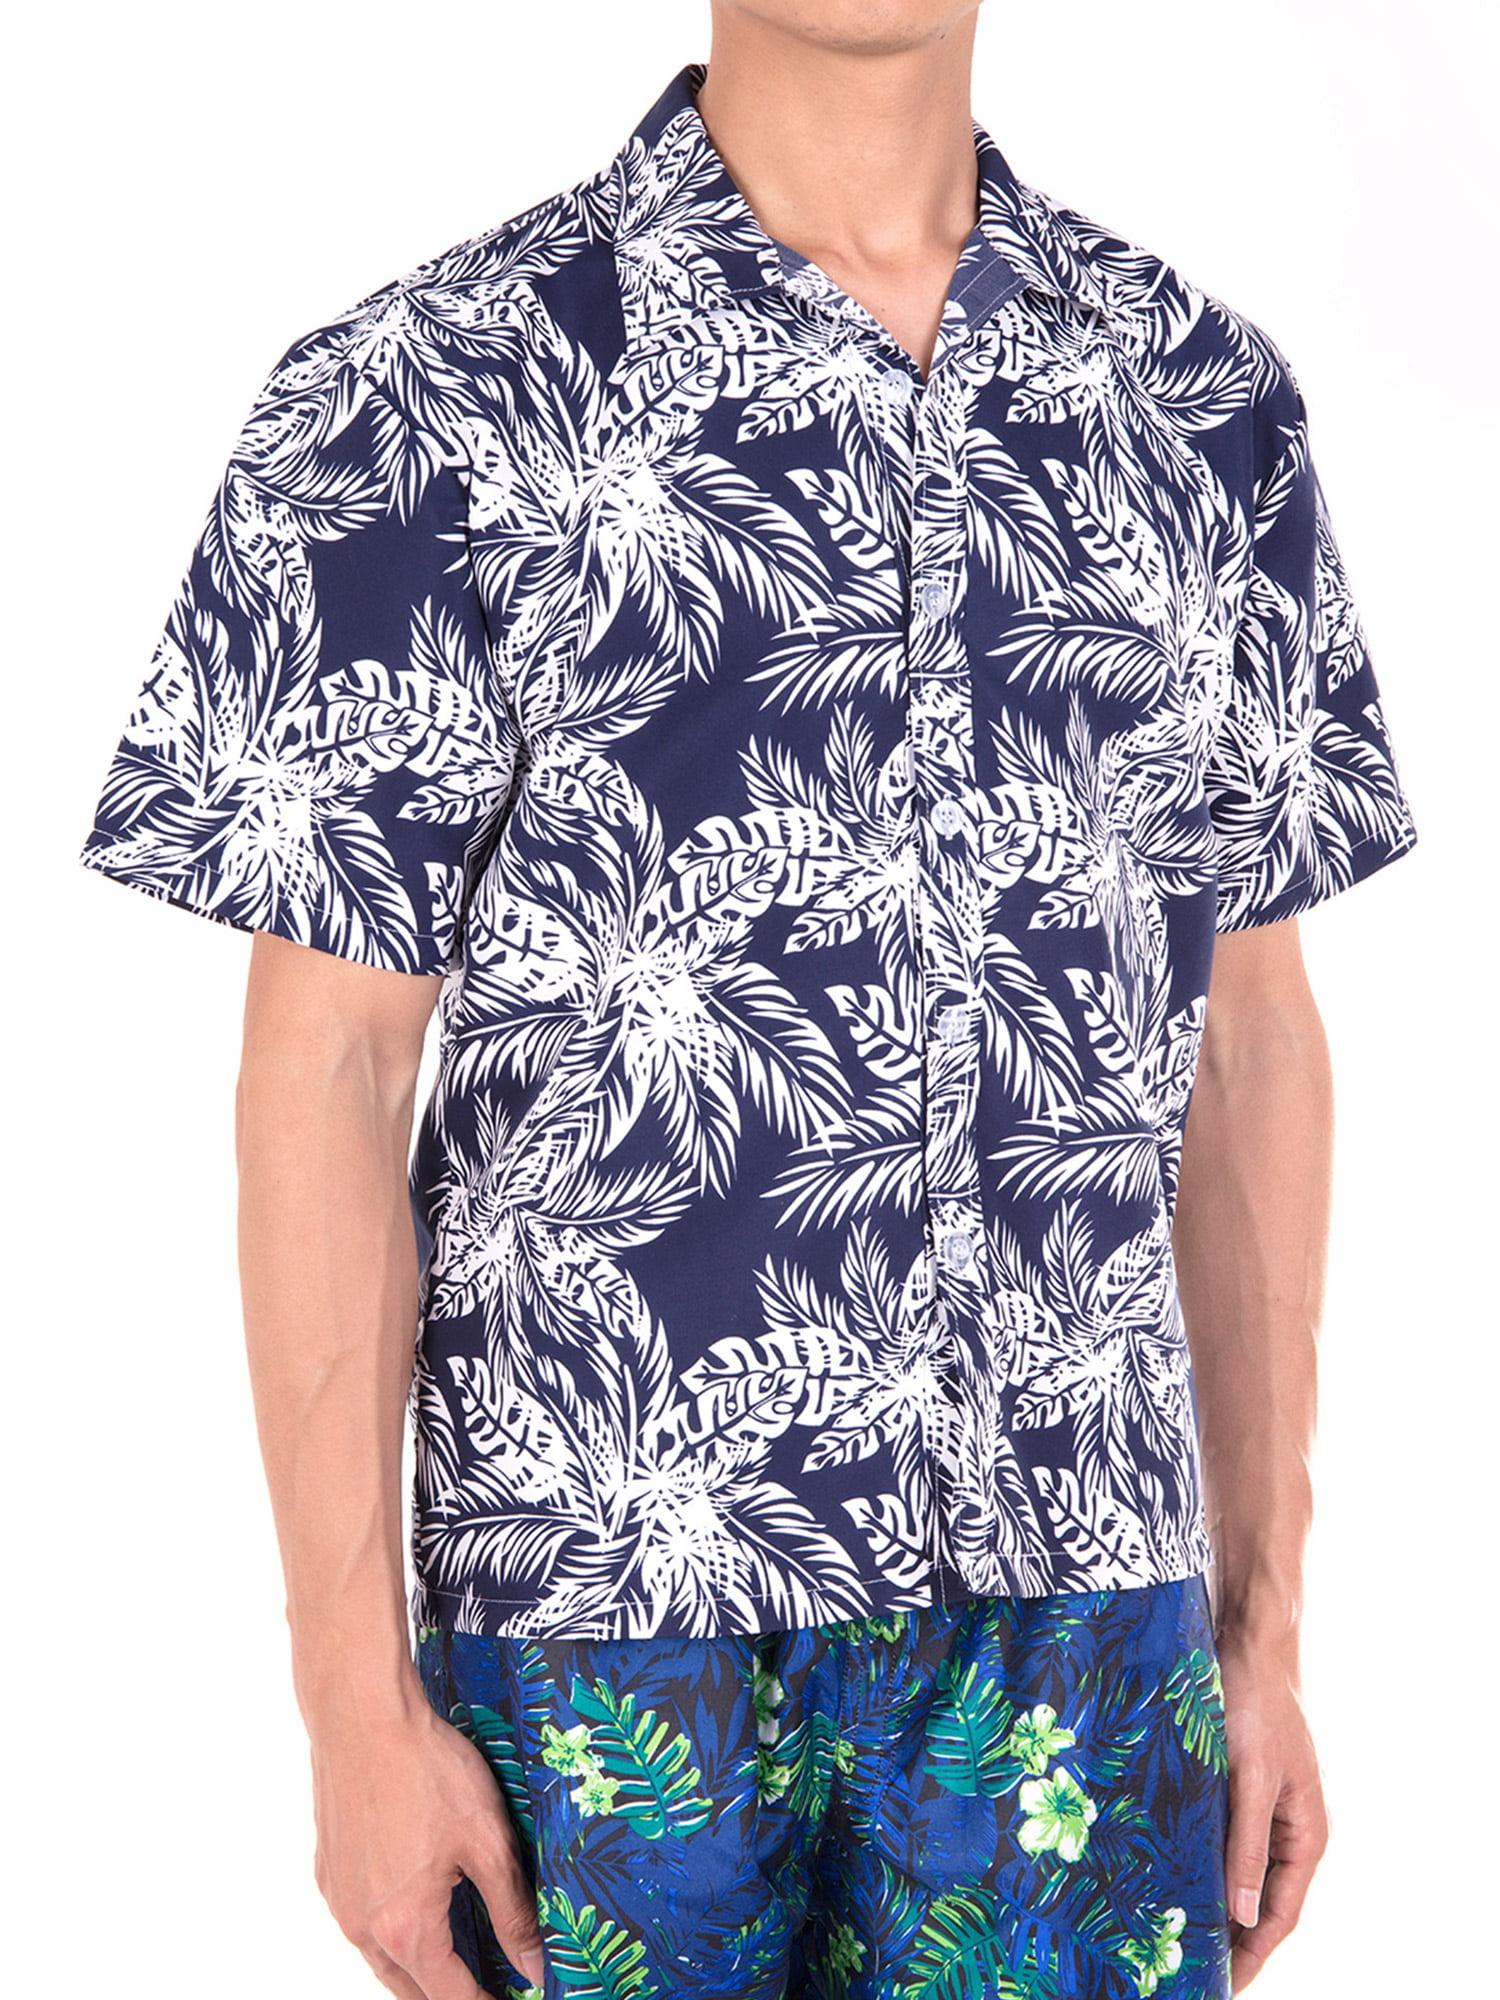 EELa Mens Short Sleeve Printed Floral Flower Casual Button Down Shirt Summer Hawaiian